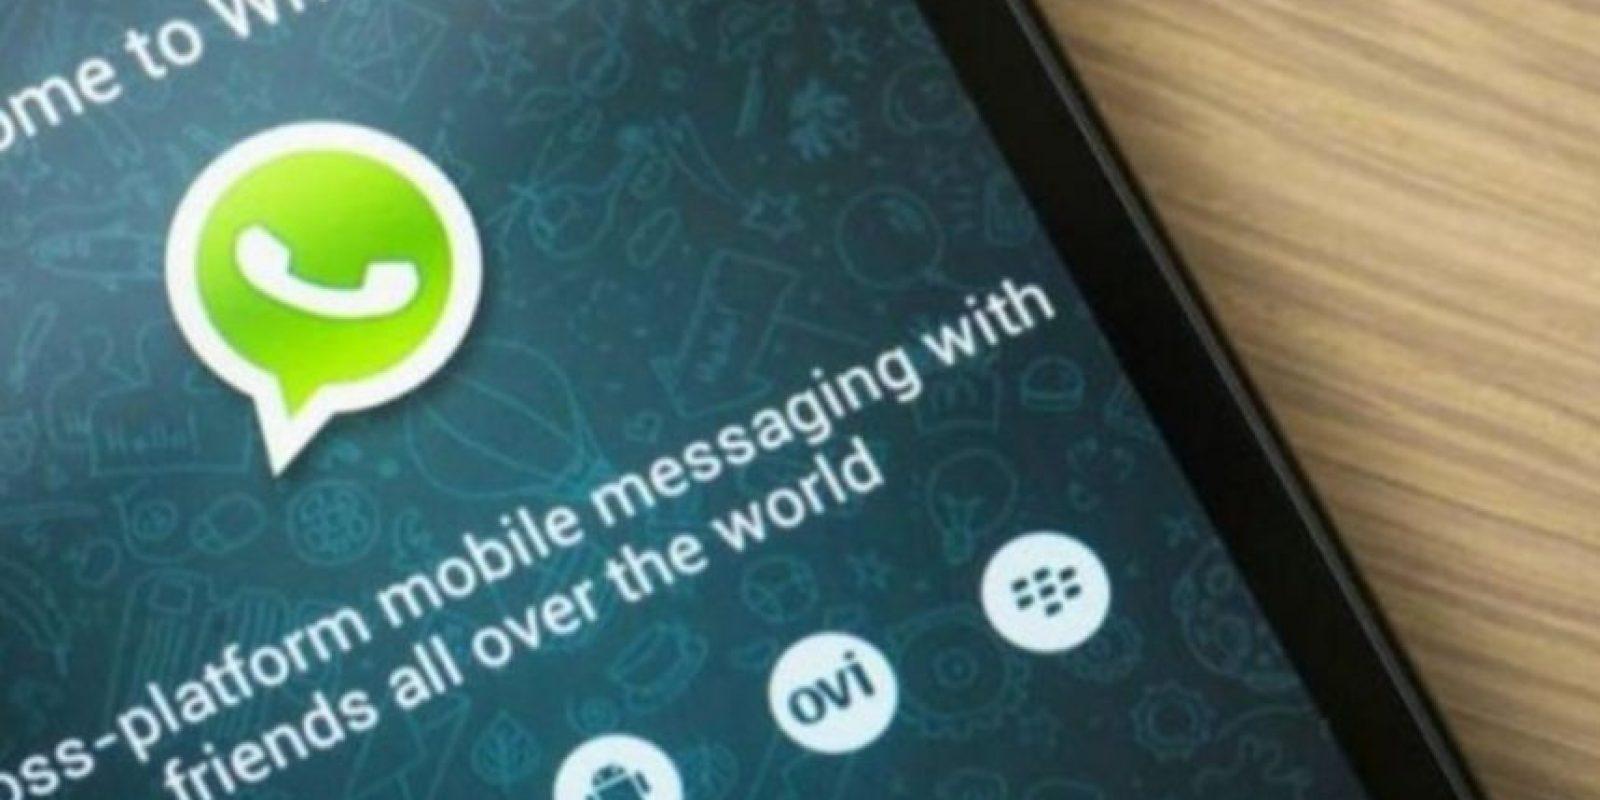 WhatsApp no es tan segura como pensamos, dicen expertos. Foto:Tumblr